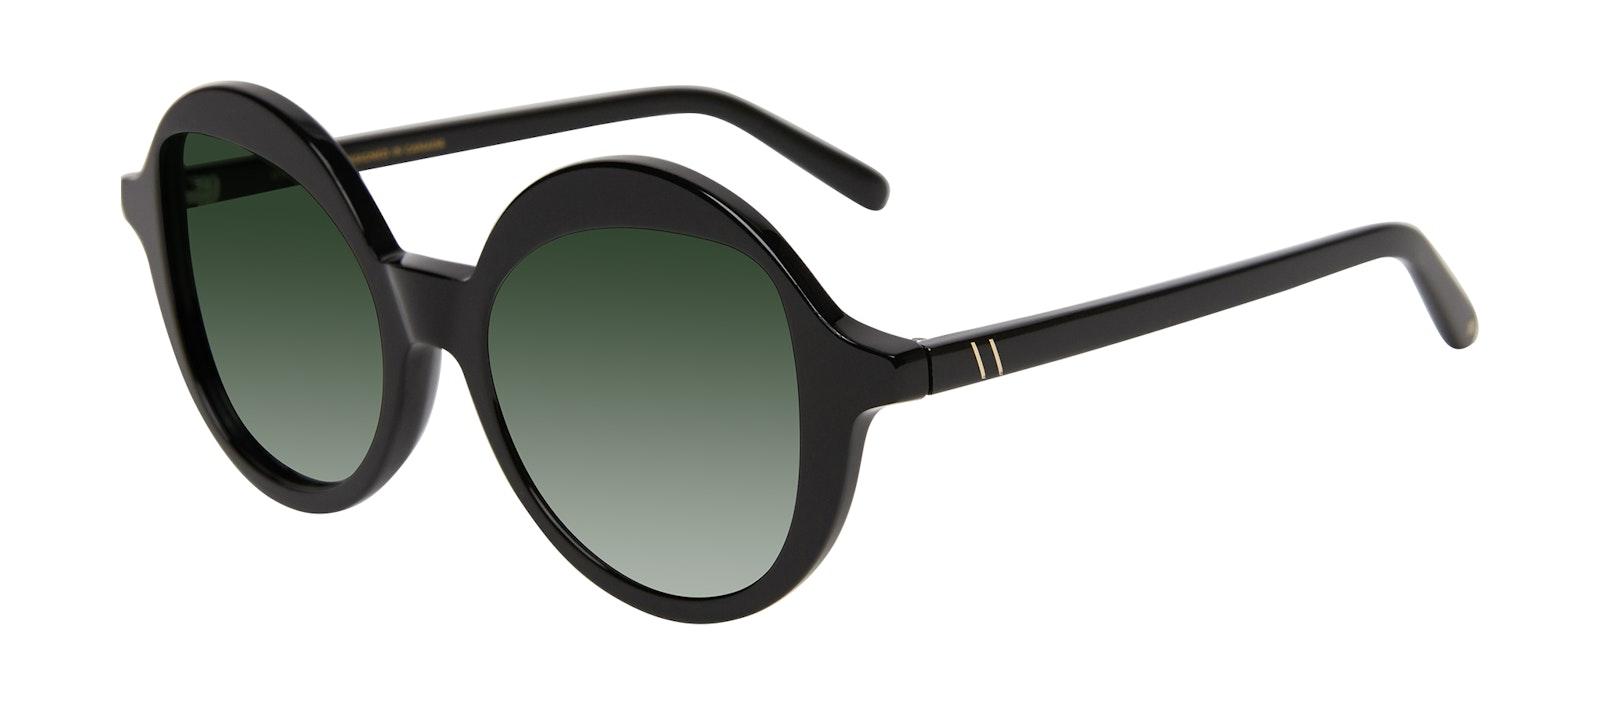 Affordable Fashion Glasses Round Sunglasses Women Stardom Black Tilt